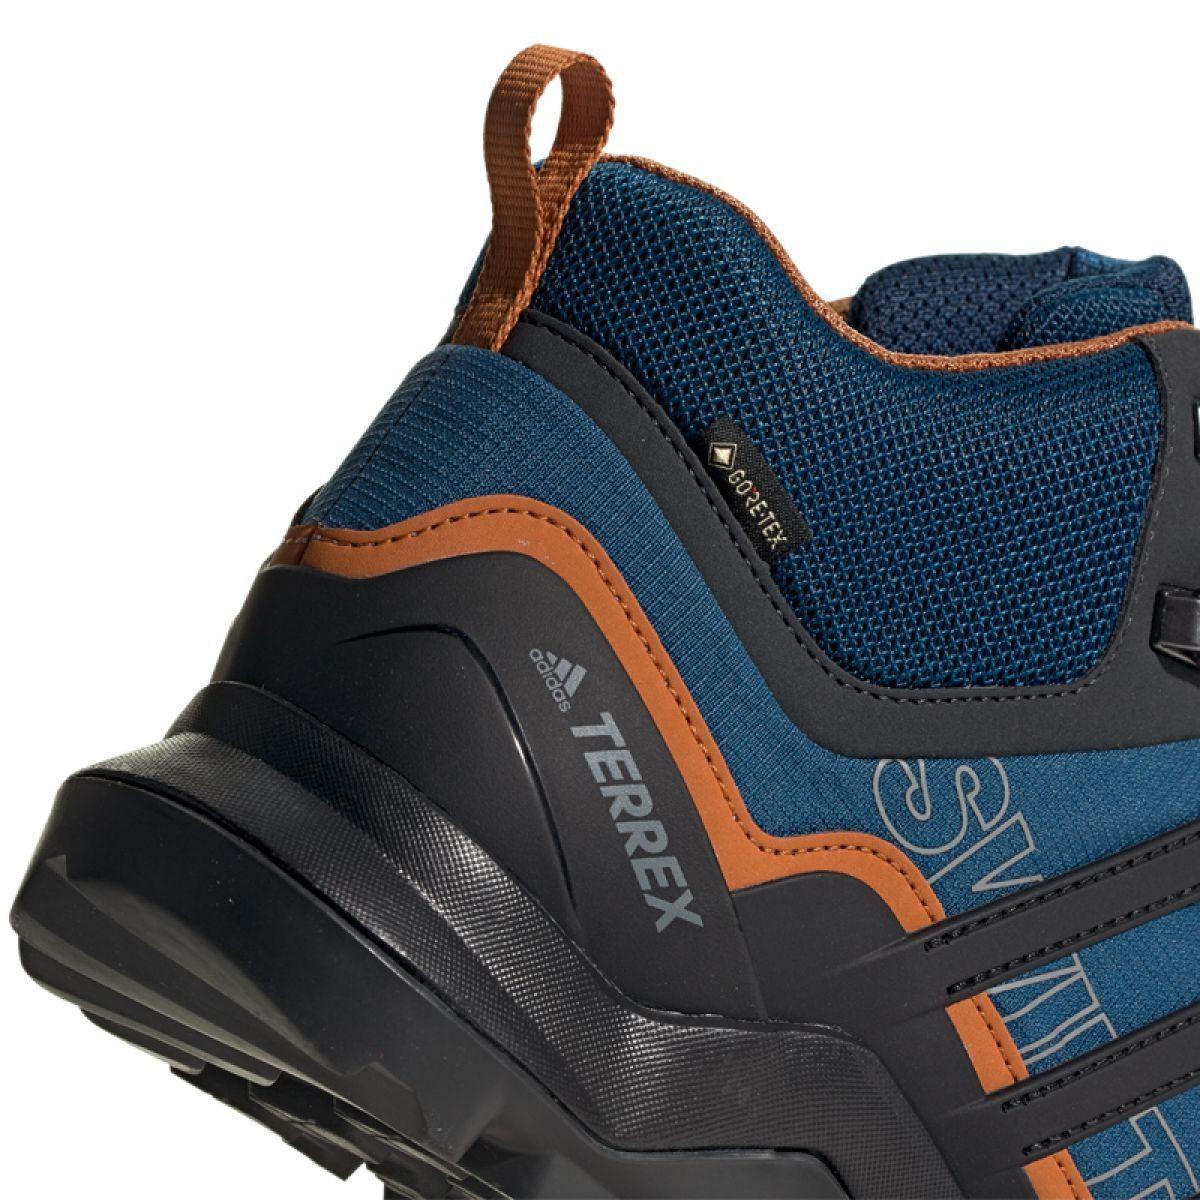 Buty Adidas Terrex Swift R2 Mid Gtx M G26551 Niebieskie Wielokolorowe Blue Shoes Trekking Shoes Sports Shoes Adidas